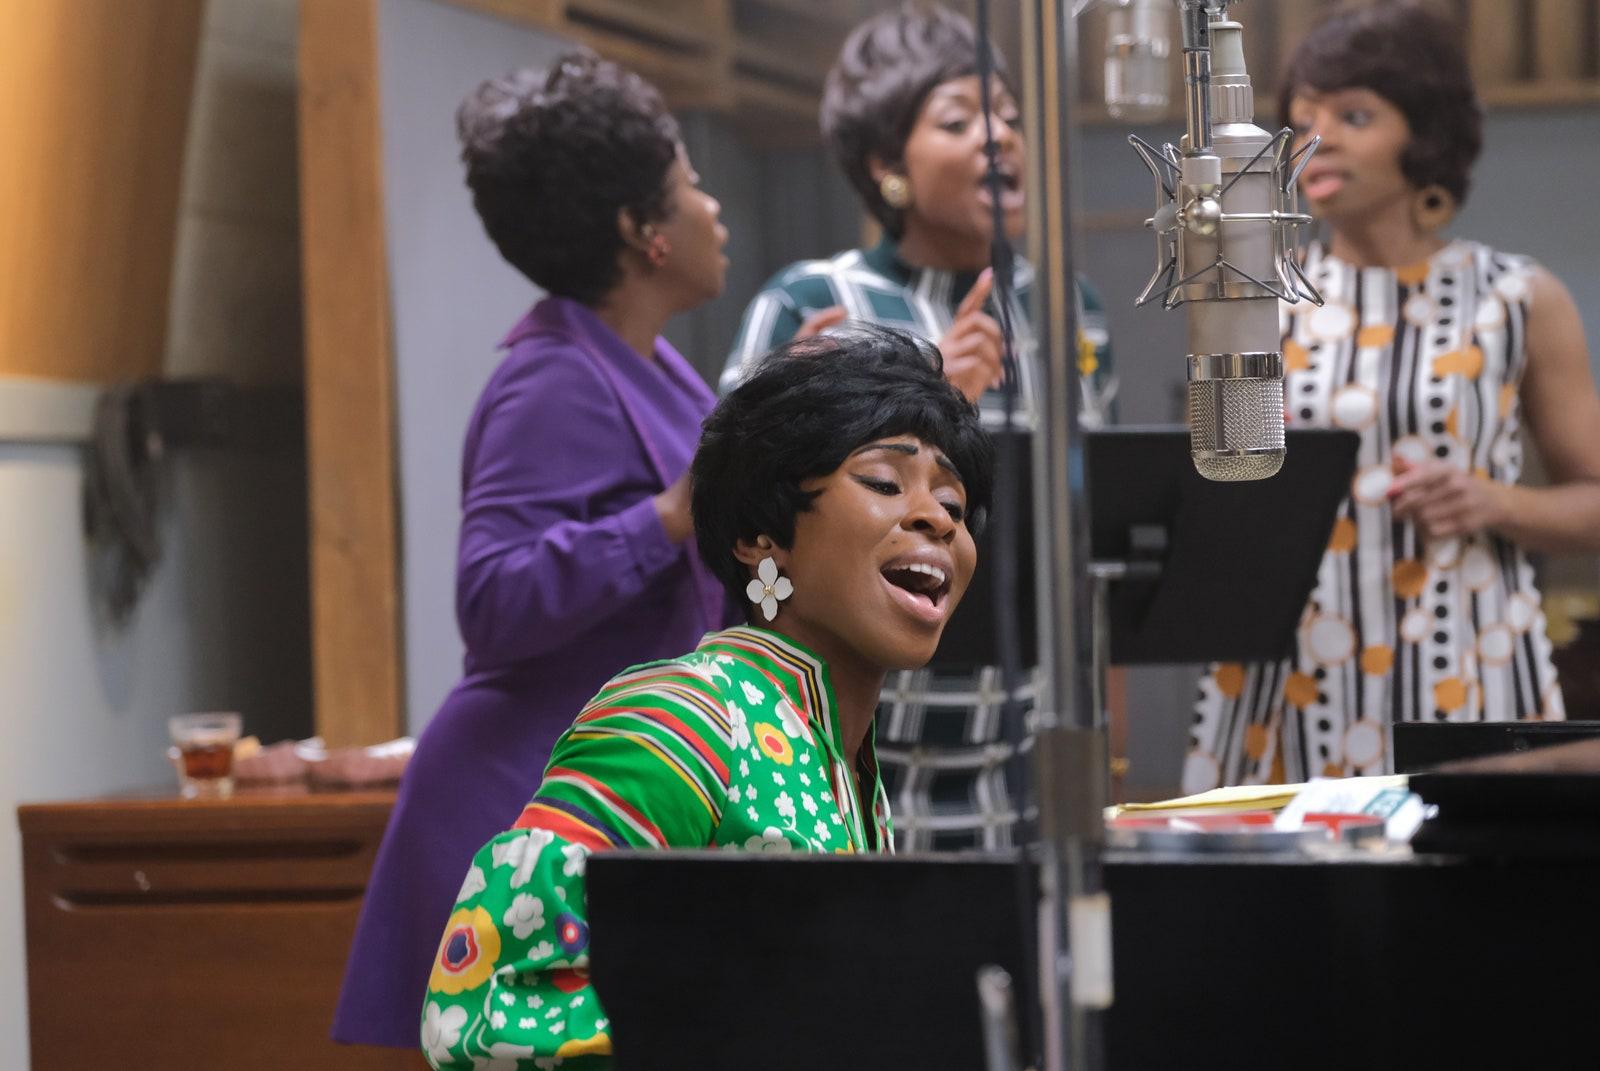 Cynthia Erivo performs as Aretha Franklin in Genius: Aretha